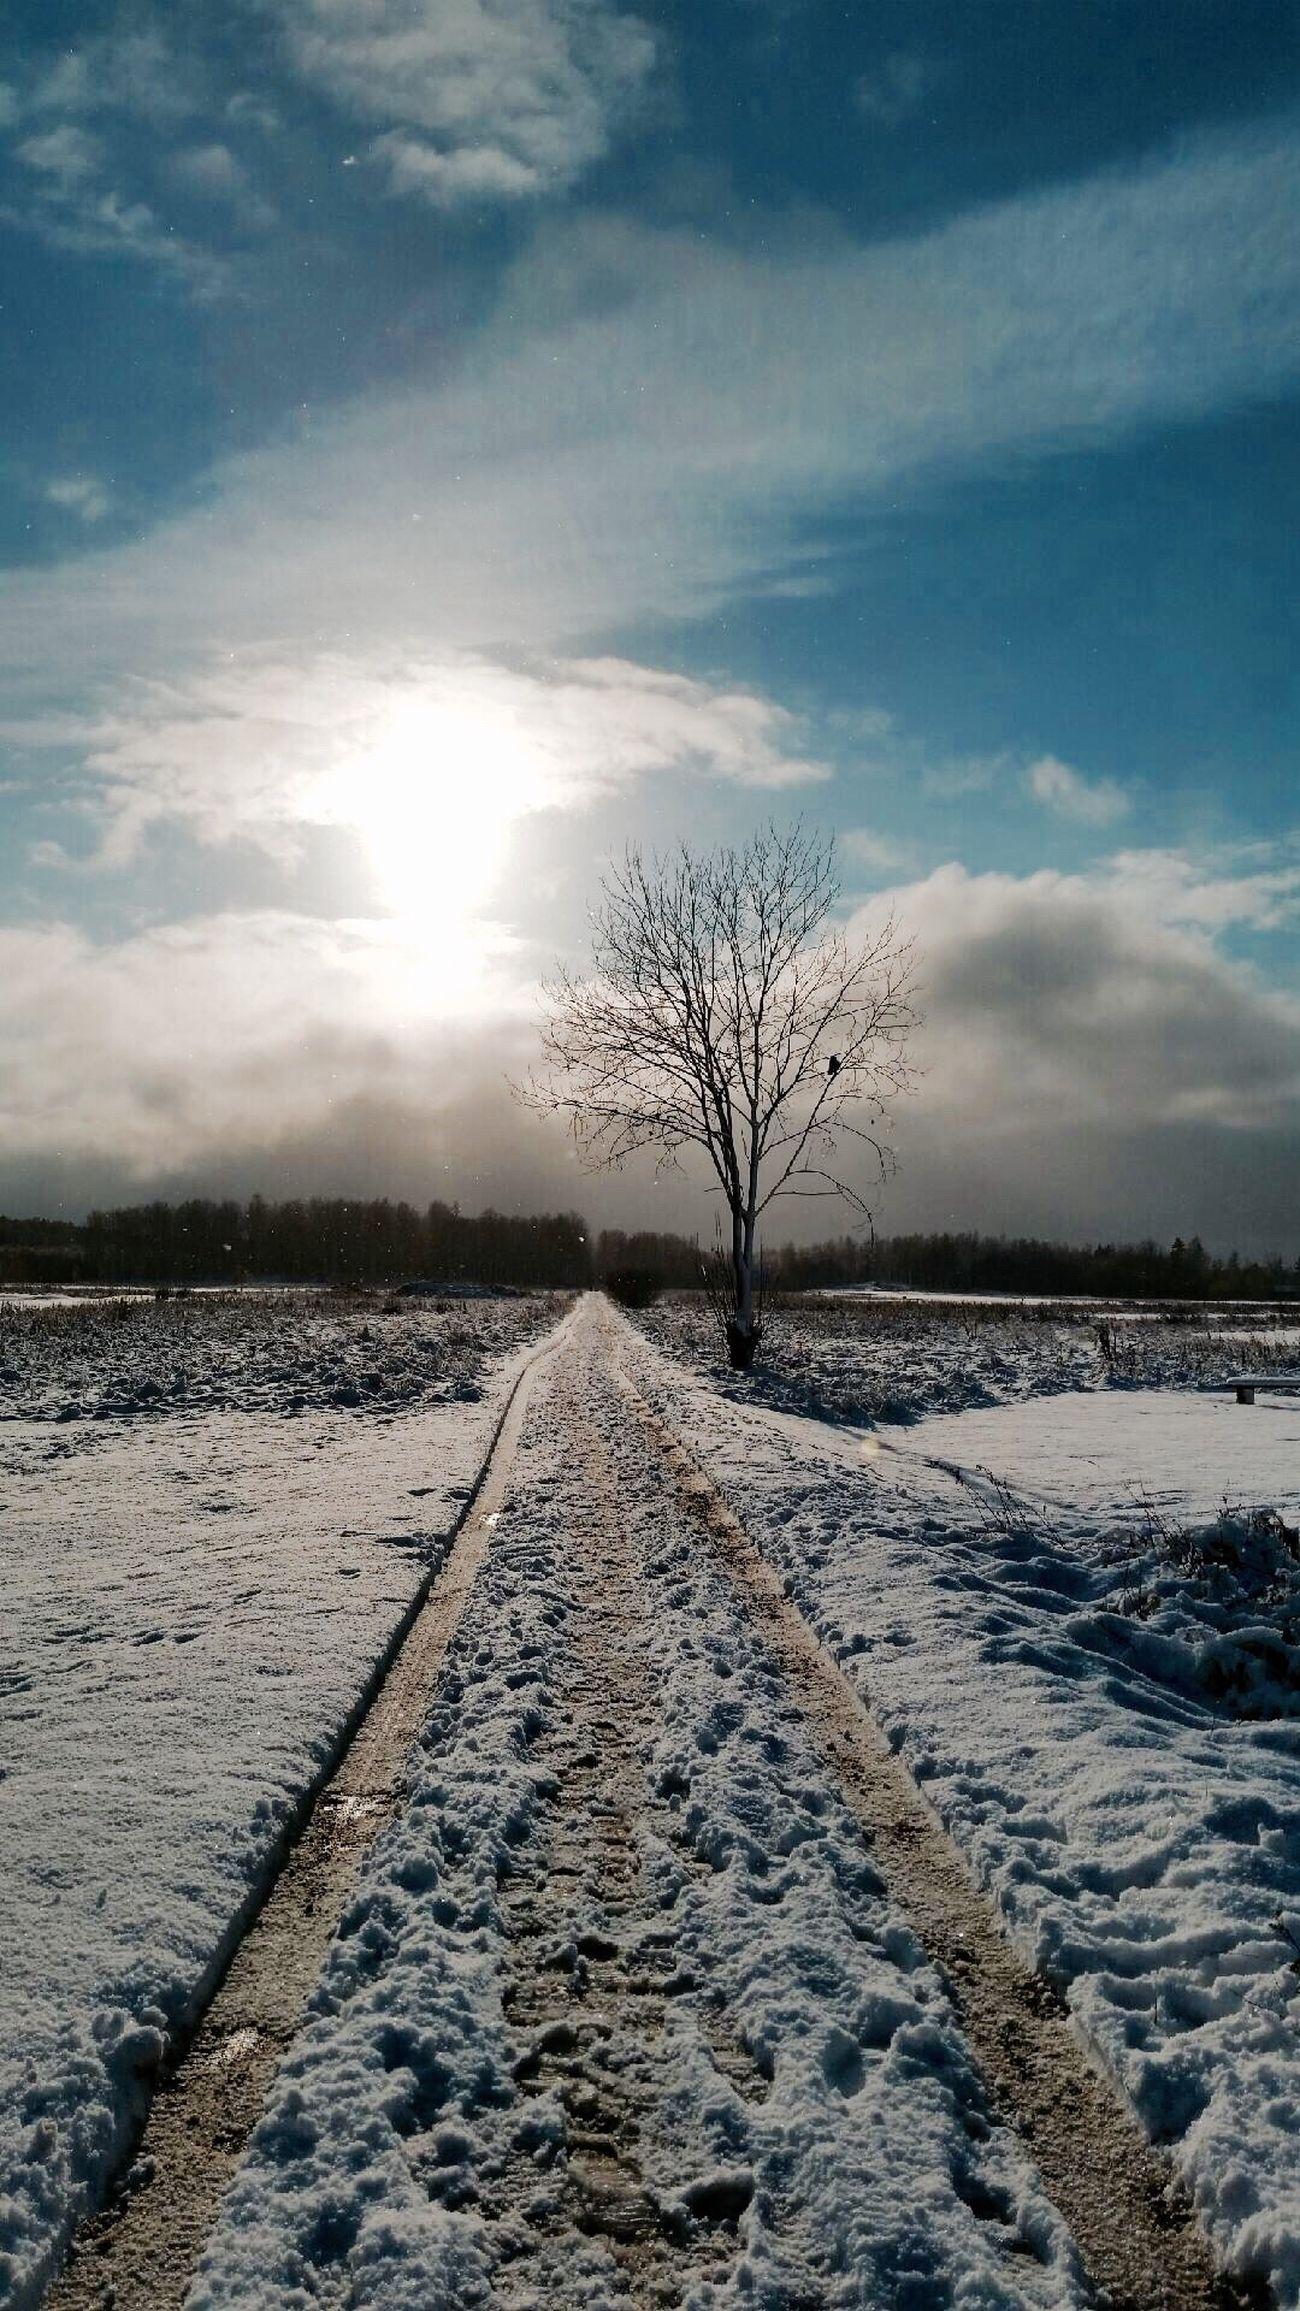 Winter EyeEmBestPics EyeEm Nature Lover Nature_collection Eye4photography  Eye4delight EyeEm Best Shots EyeEm Best Shots - Nature Nature Photography Snow